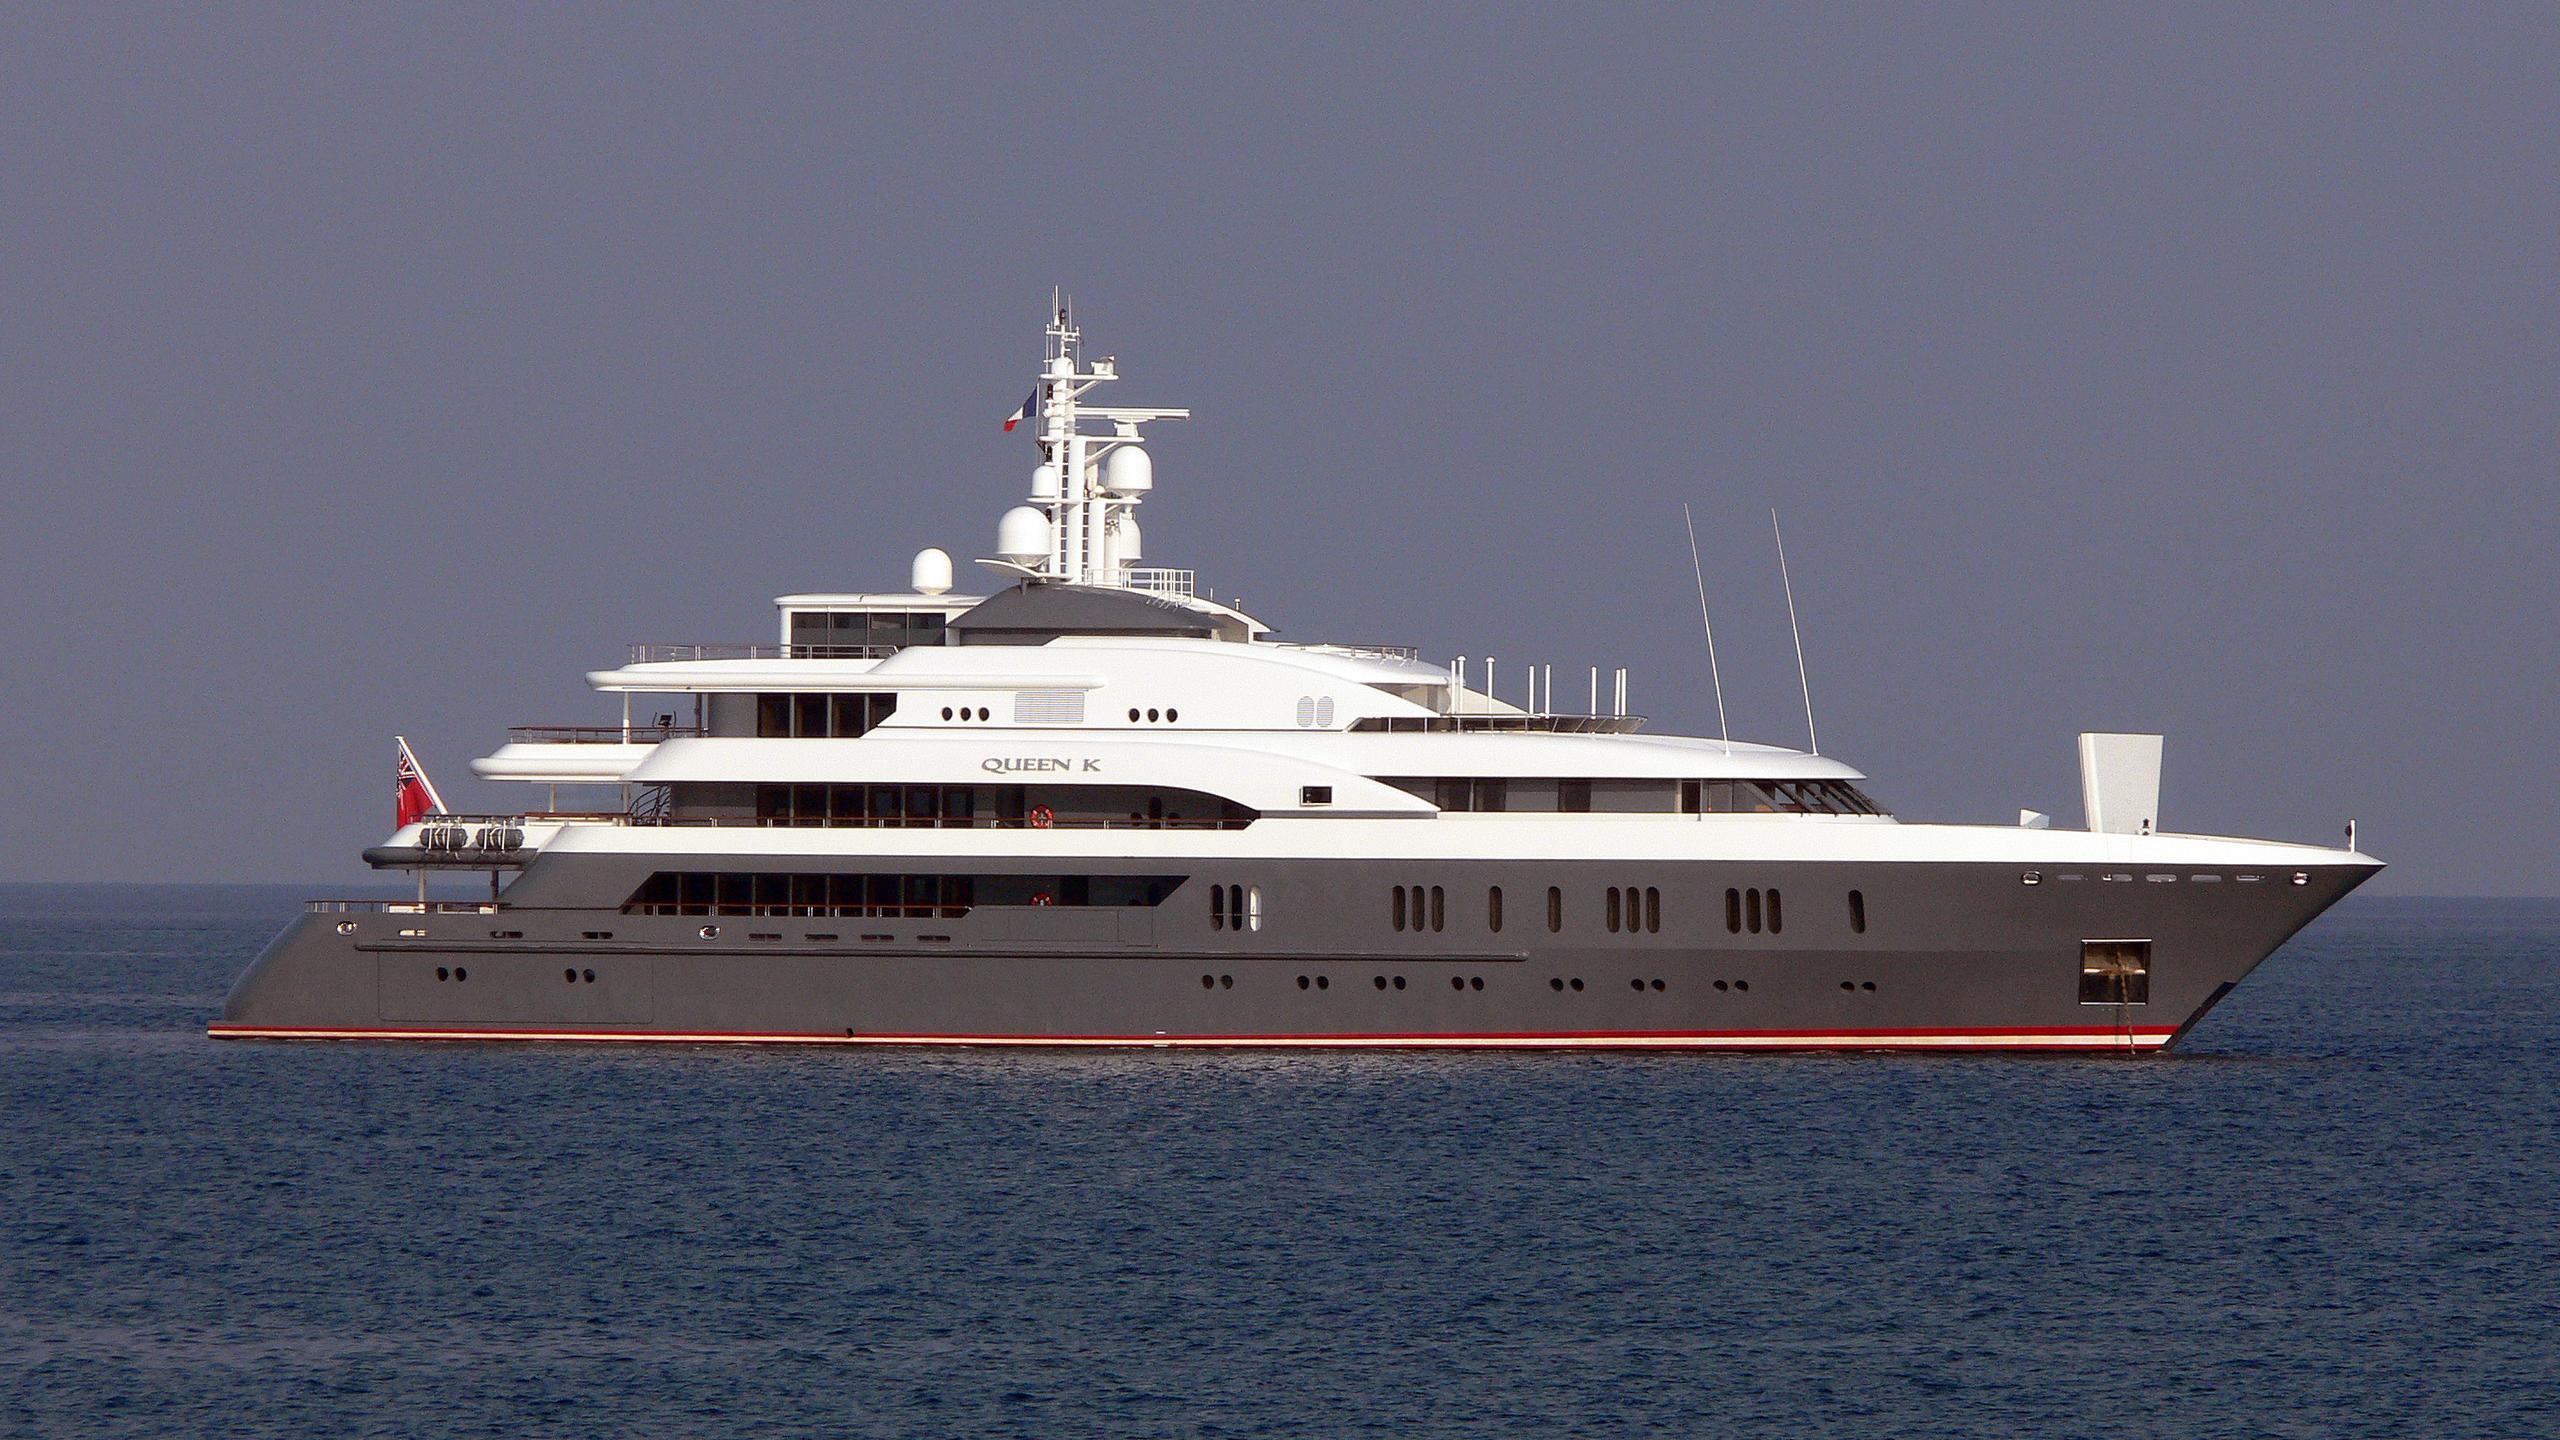 queen-k-motor-yacht-lurssen-2004-73m-profile